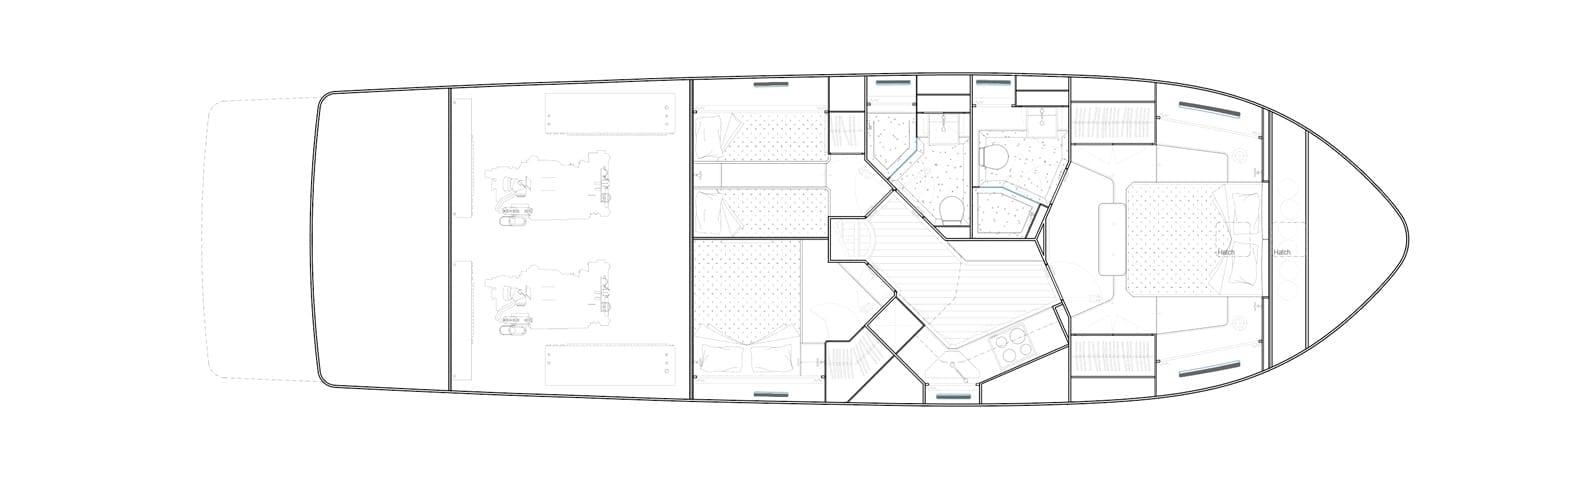 Uniesse-HT-6-Floor-3-b